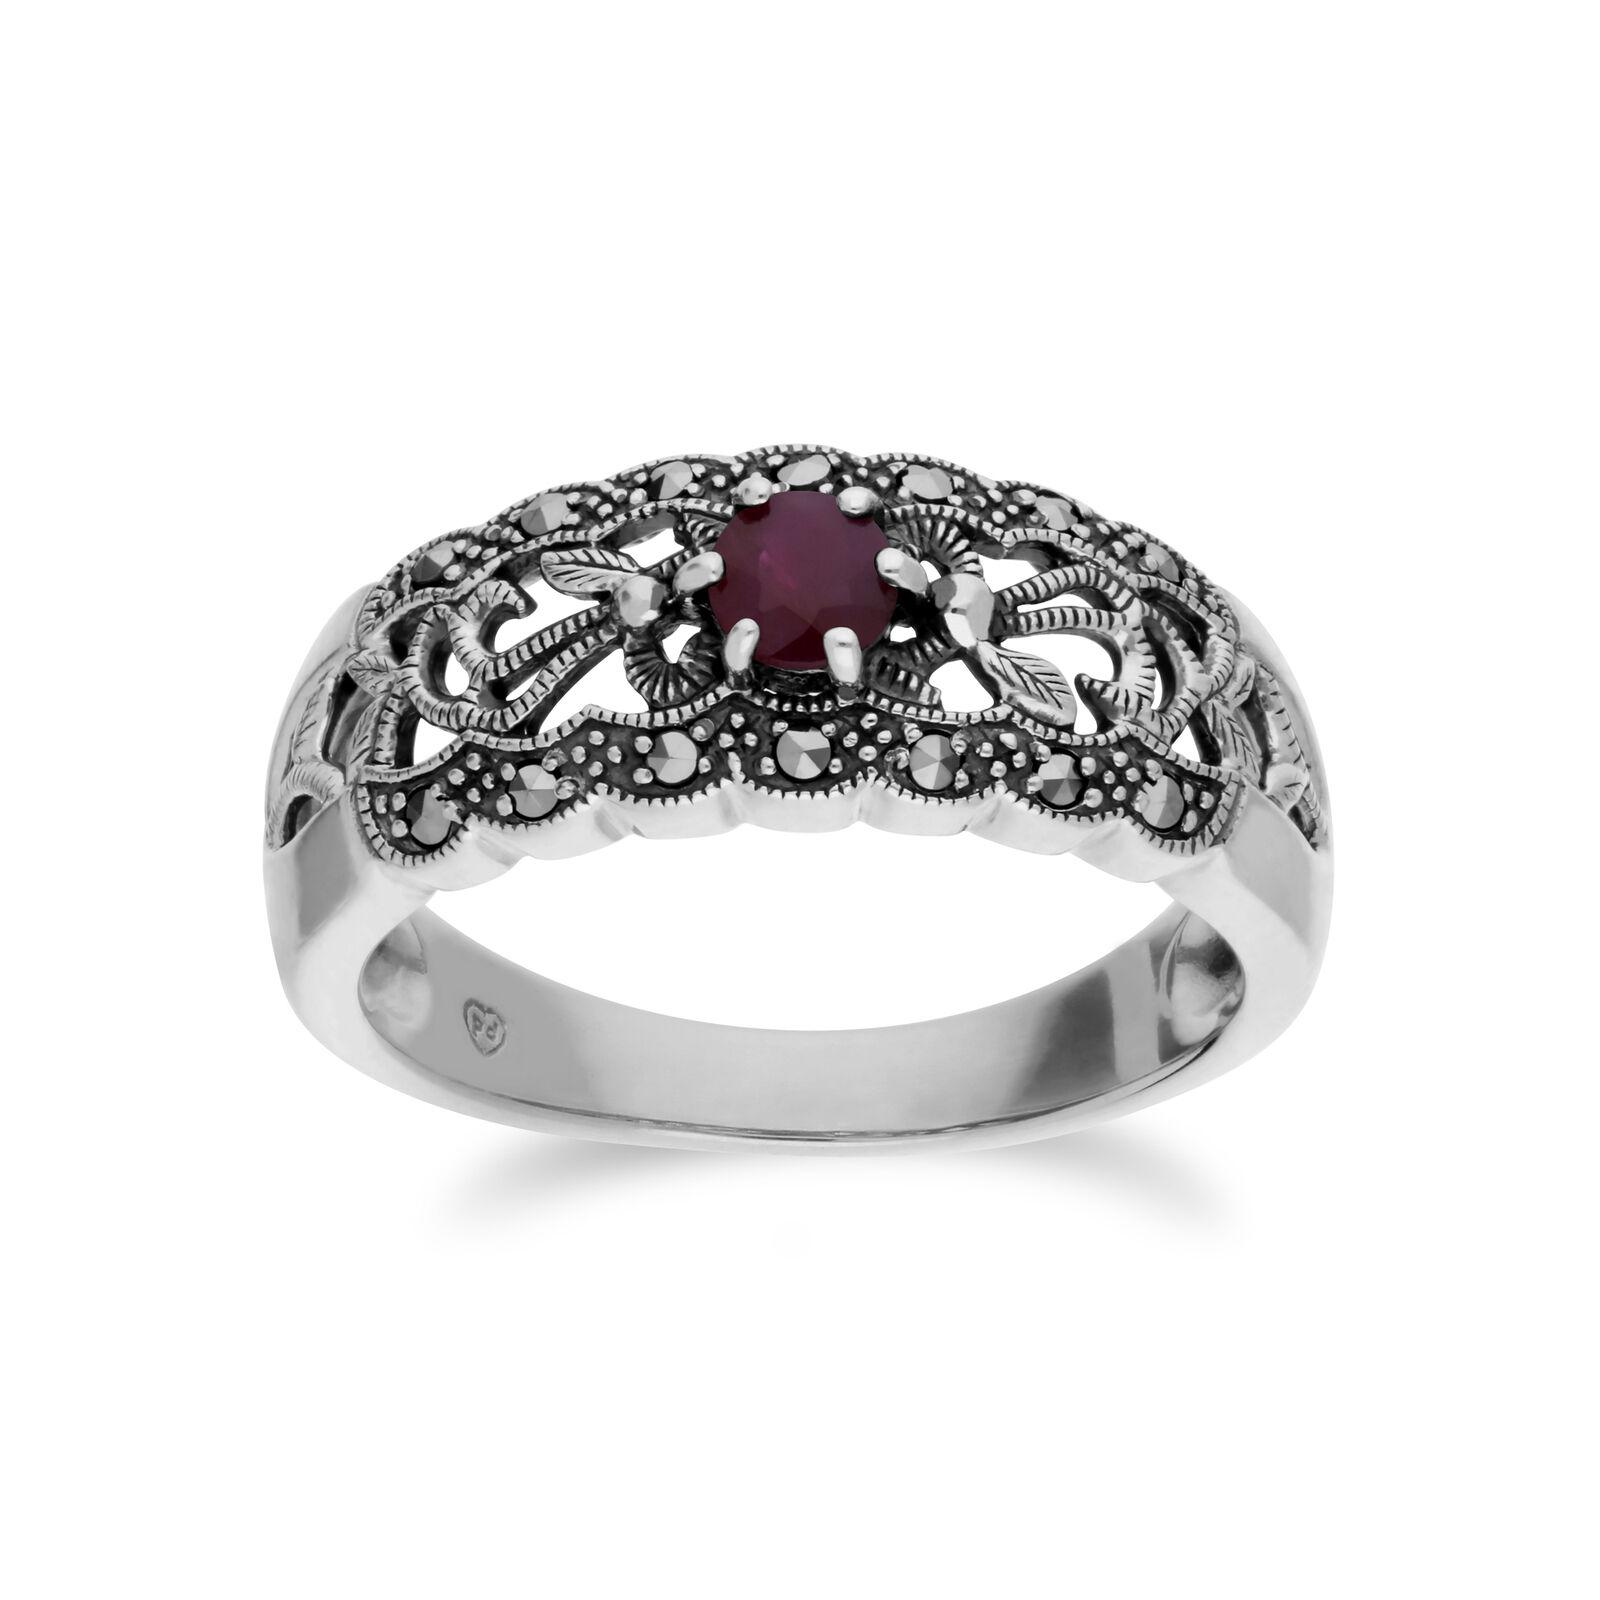 Gemondo Sterlingsilver Rubin & Markasit Jugendstil Ring